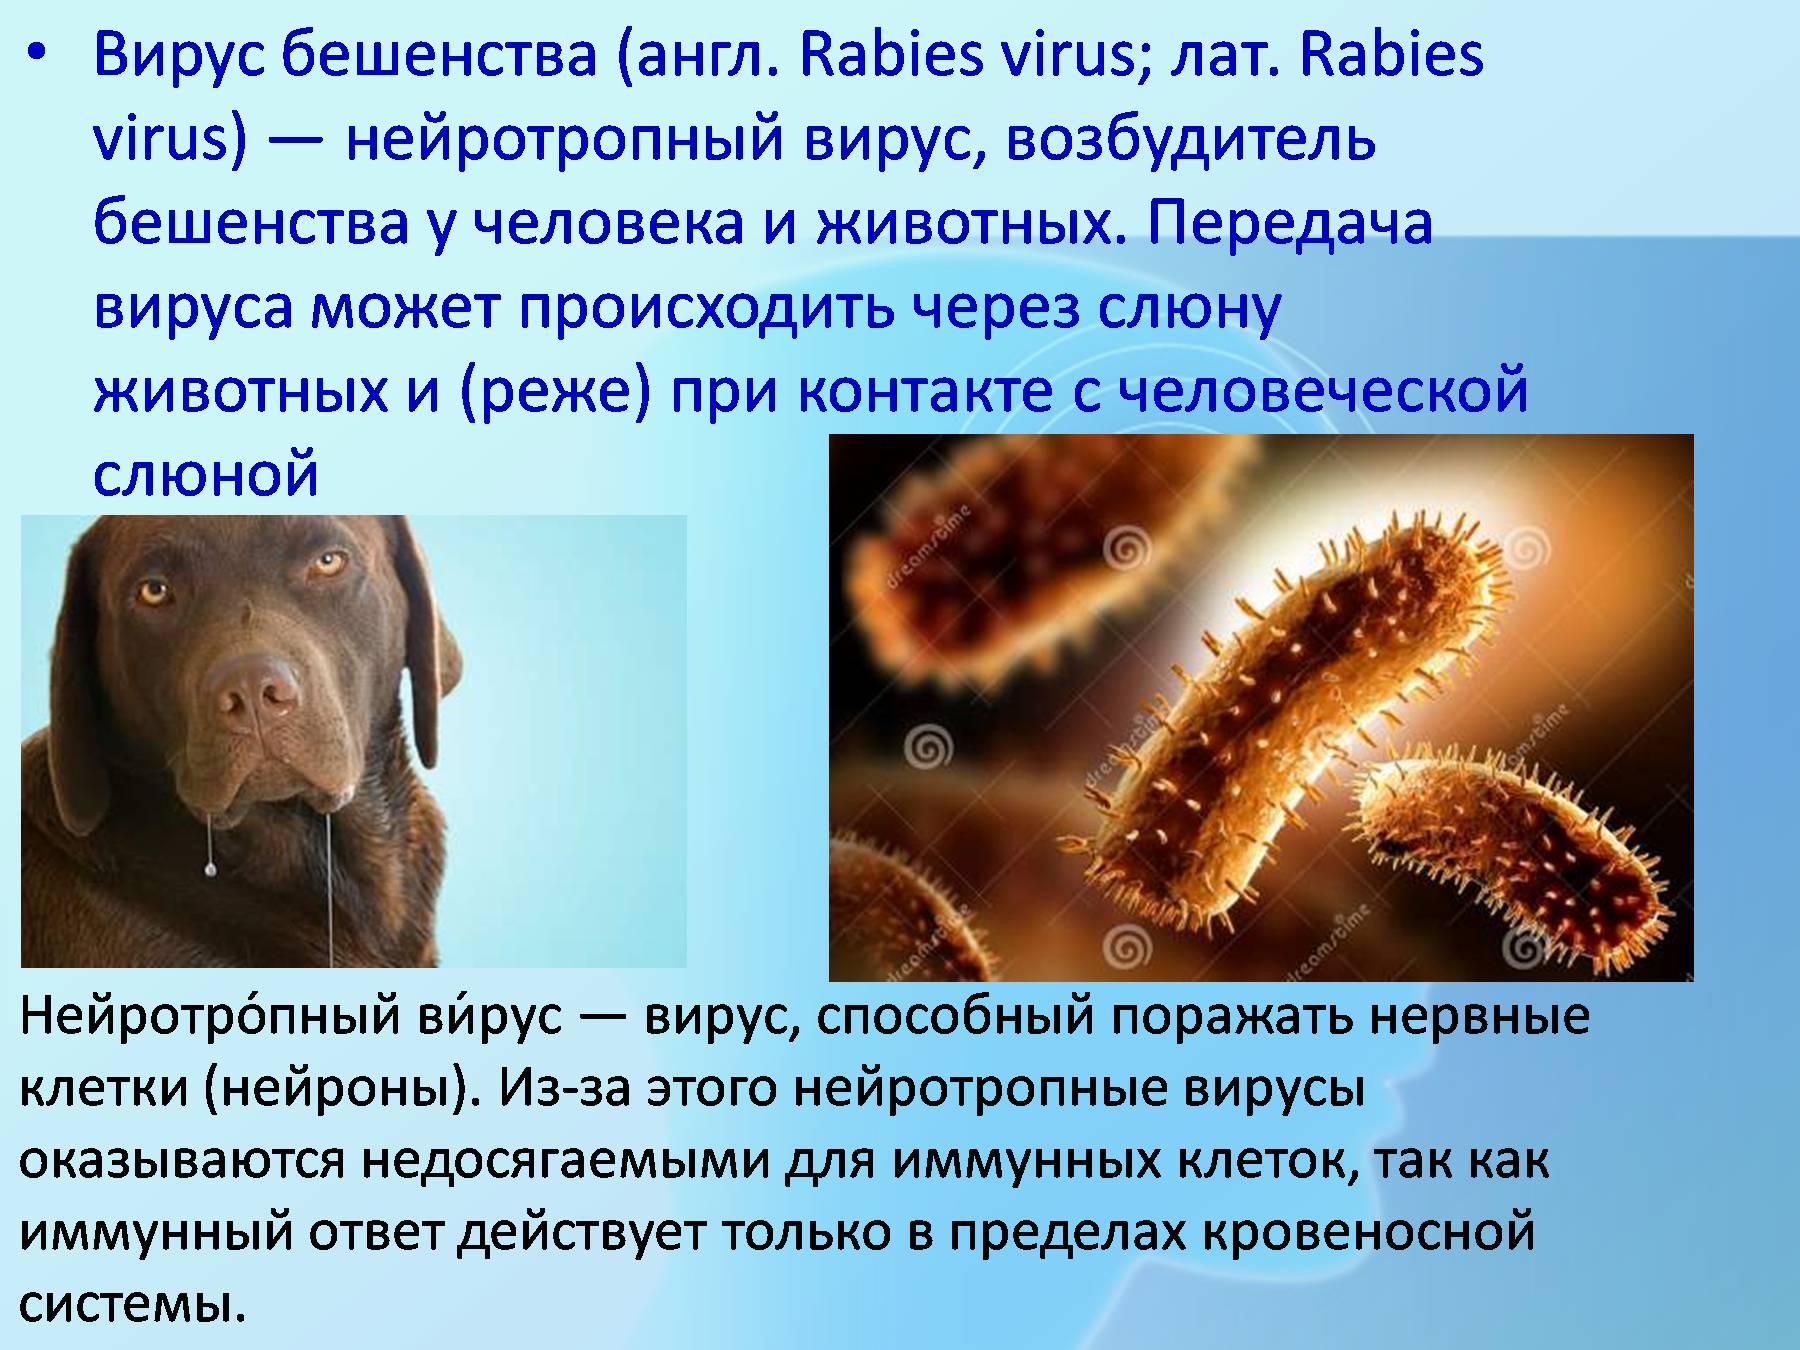 Картинка вируса бешенства